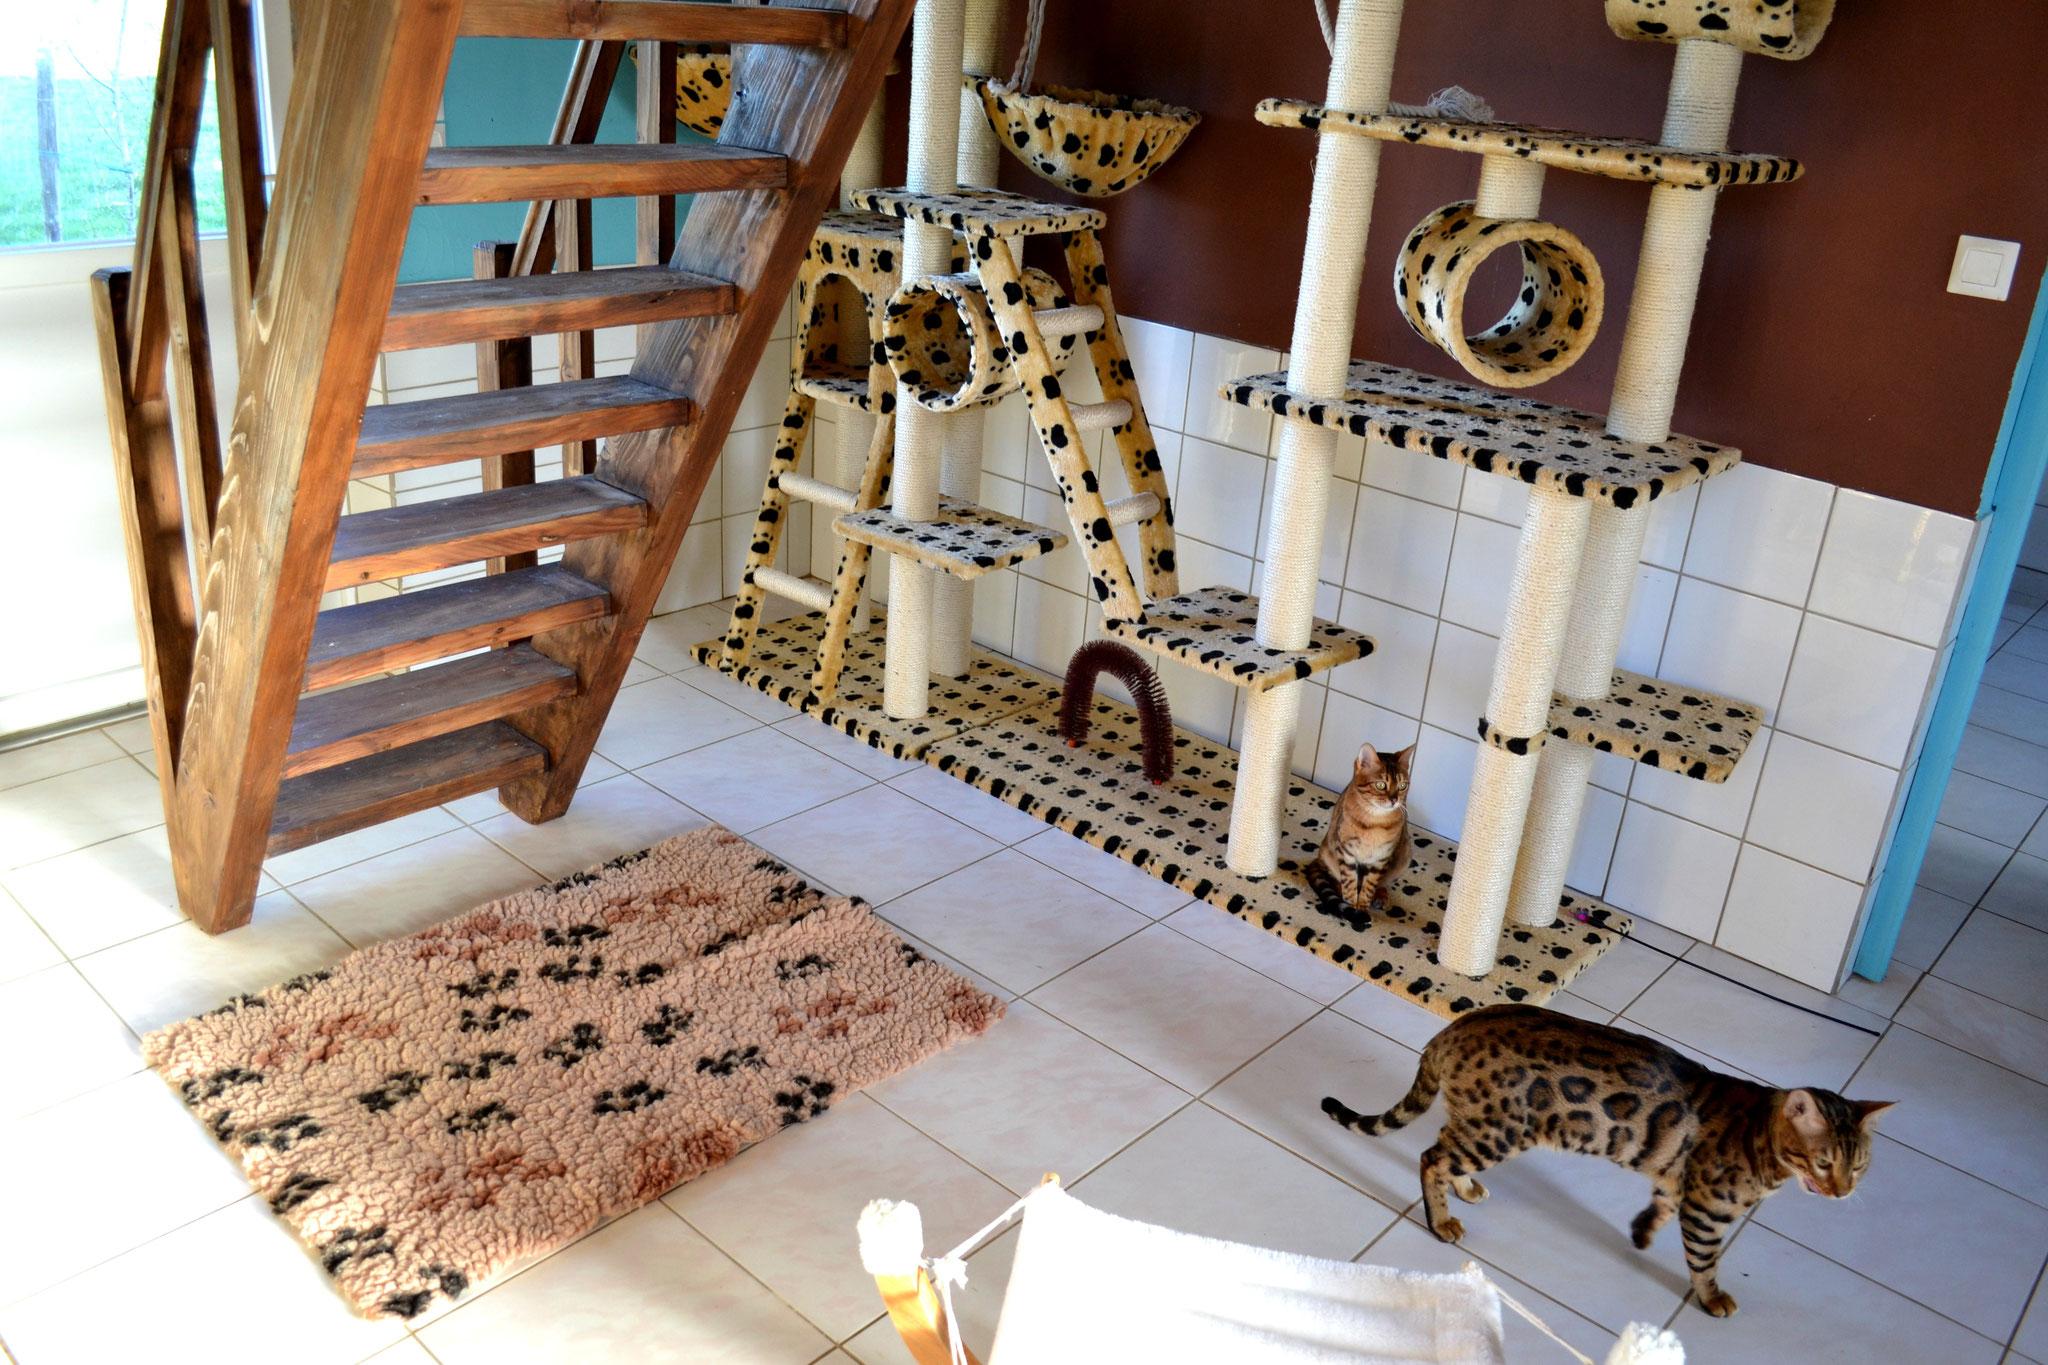 levage de chat et chaton bengal elevage tribal bengal. Black Bedroom Furniture Sets. Home Design Ideas